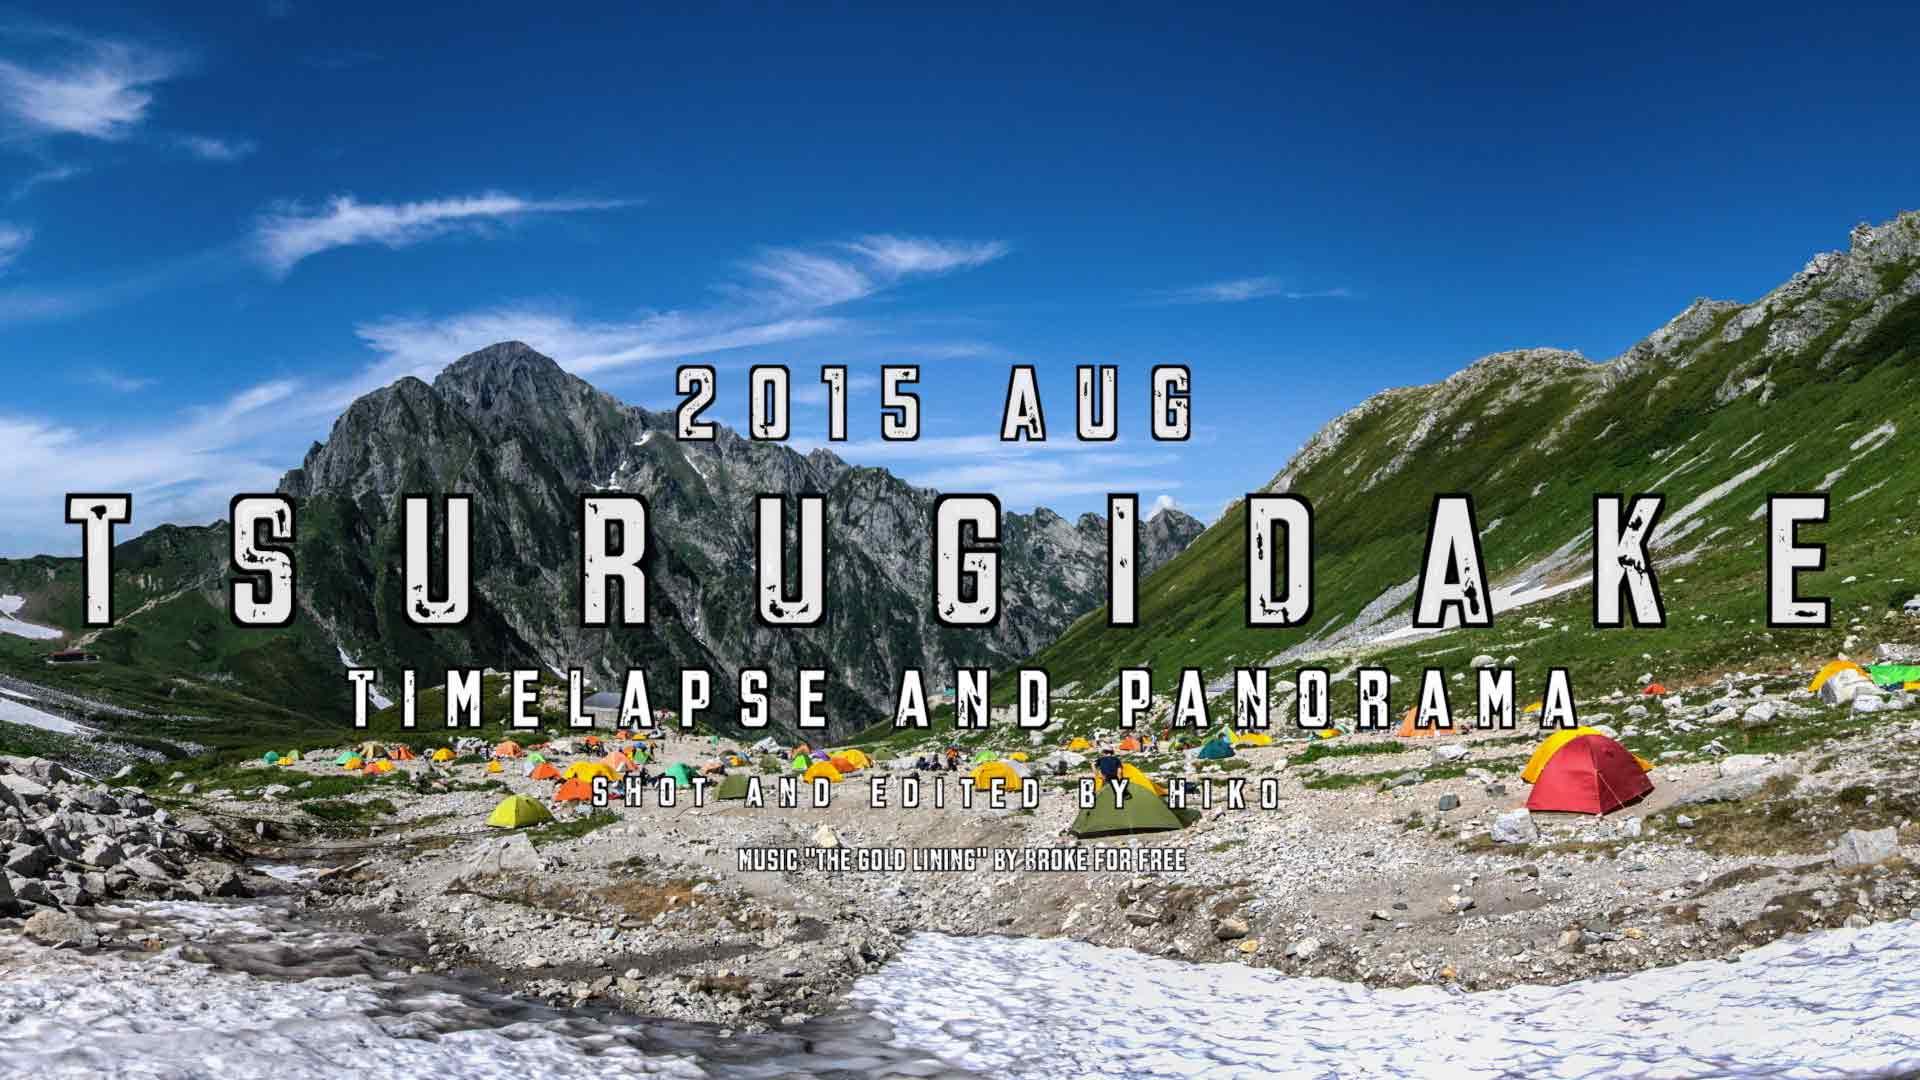 Tsurugidake-Timelapse-and-Panorama-Featured-Image